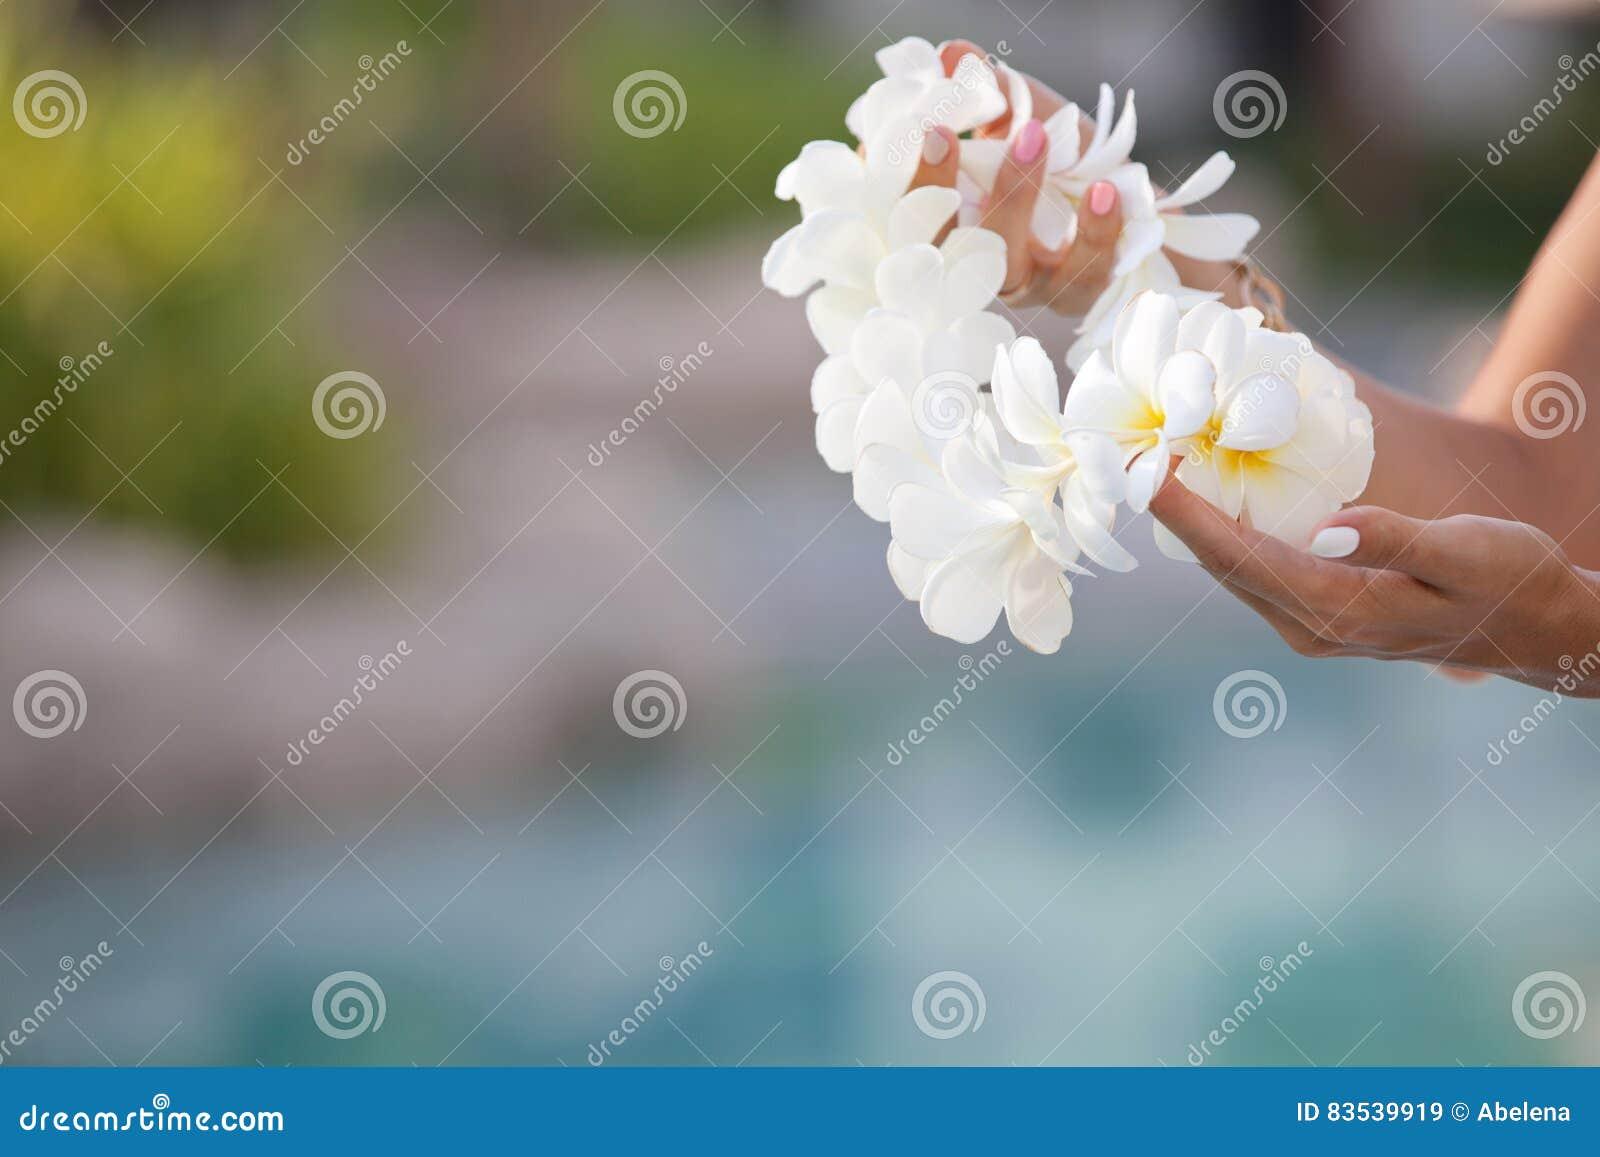 Woman hands holding flower lei garland of white plumeria stock download woman hands holding flower lei garland of white plumeria stock image image of izmirmasajfo